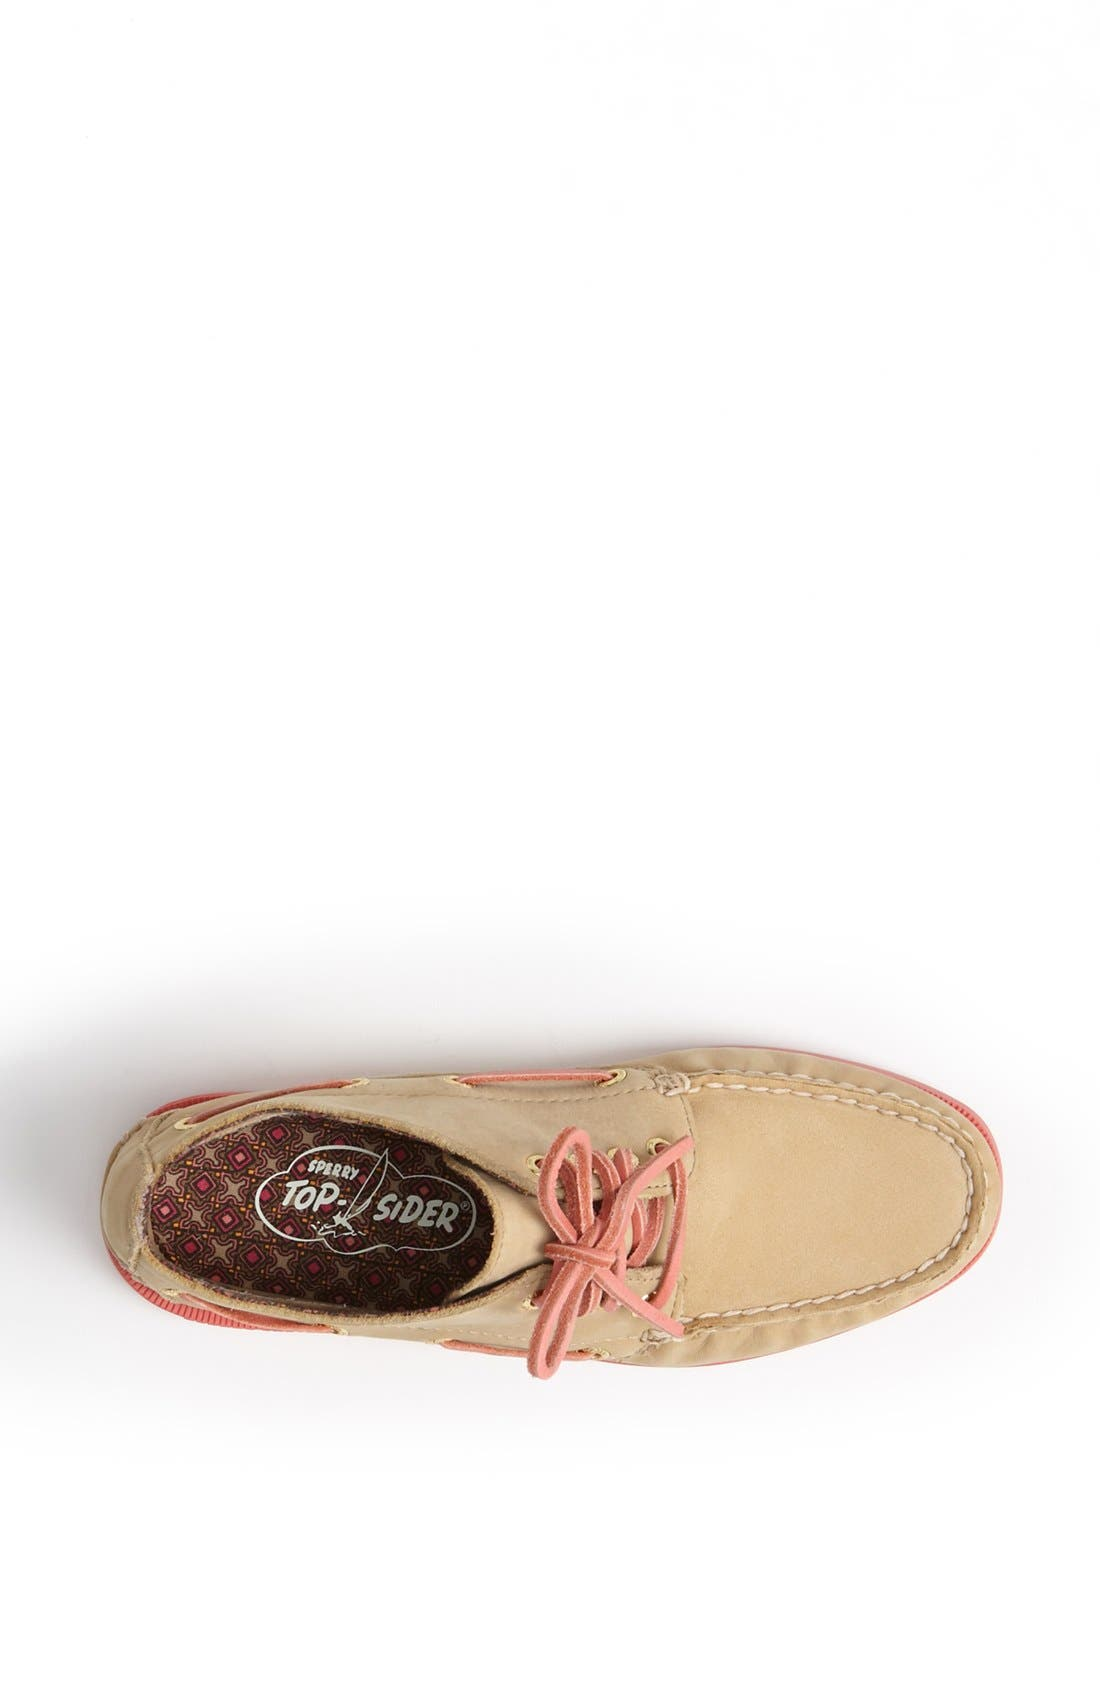 Alternate Image 3  - Sperry Top-Sider® 'Baystar' Chukka Boot (Women)